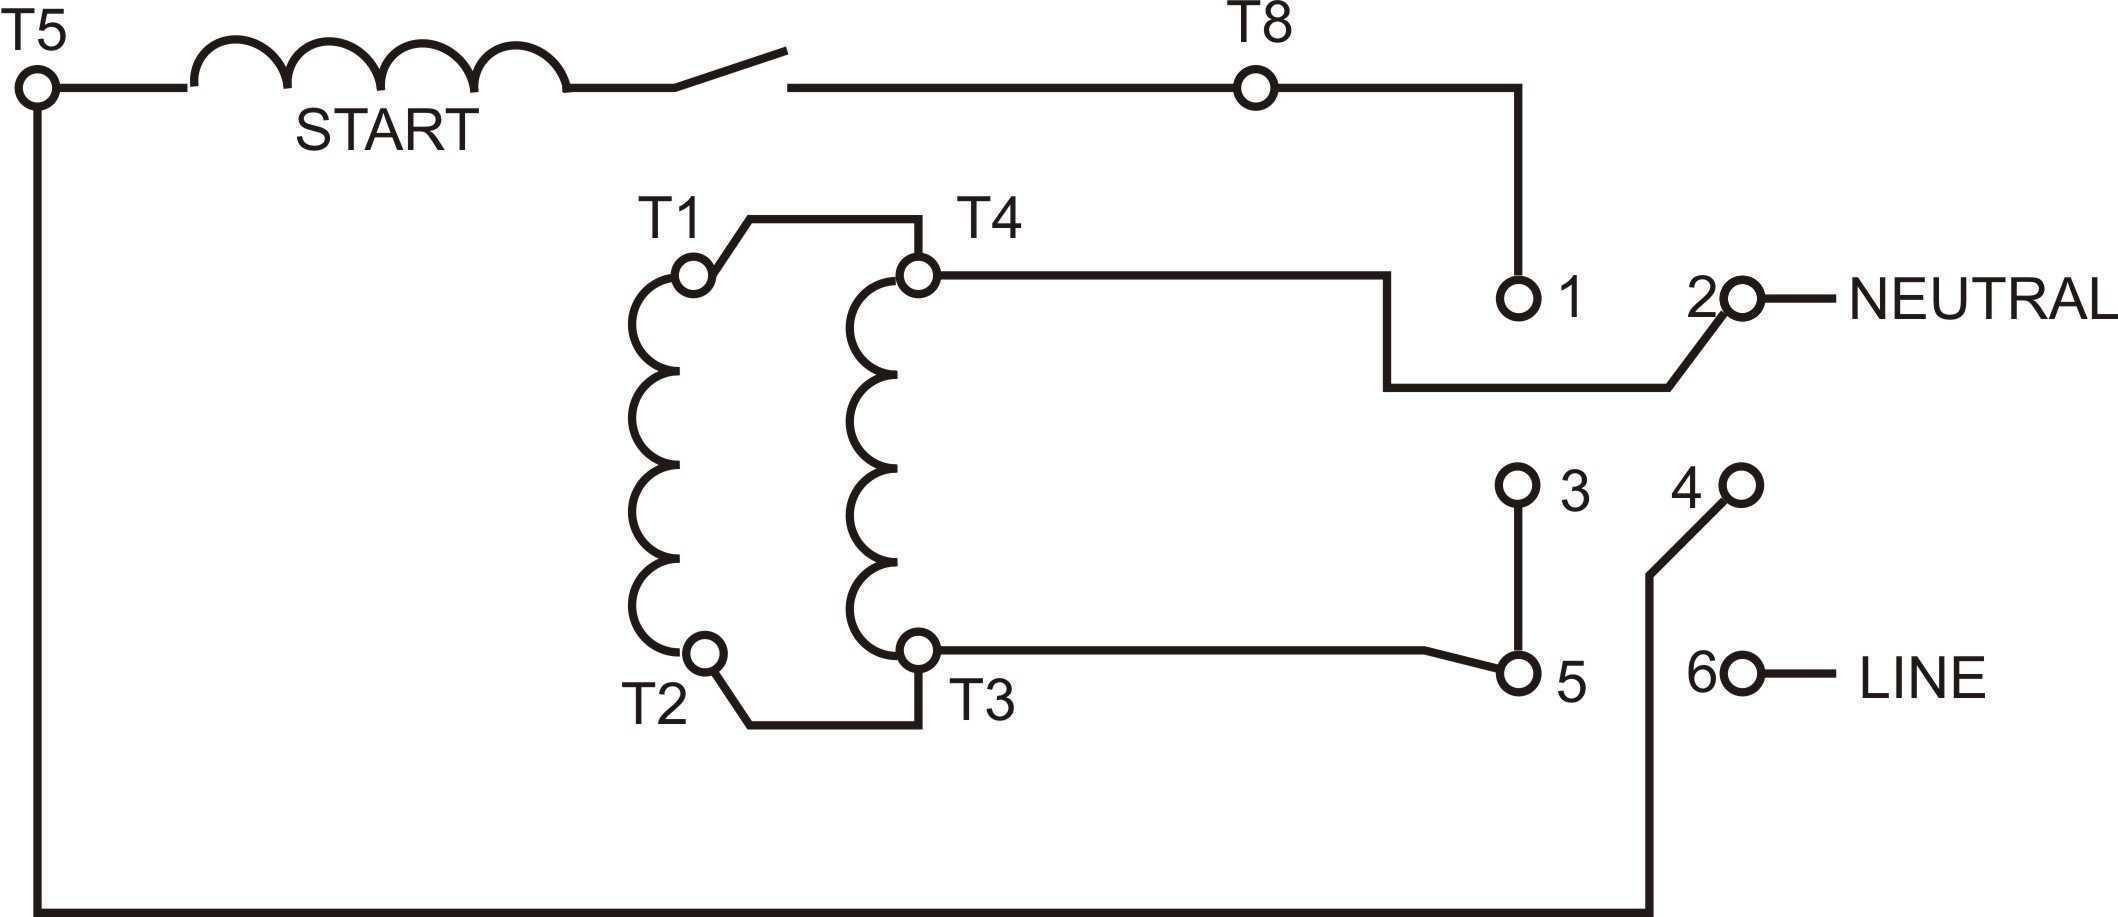 Low Voltage 6 Lead Motor Wiring Diagram   Wiring Diagram - 6 Lead Single Phase Motor Wiring Diagram